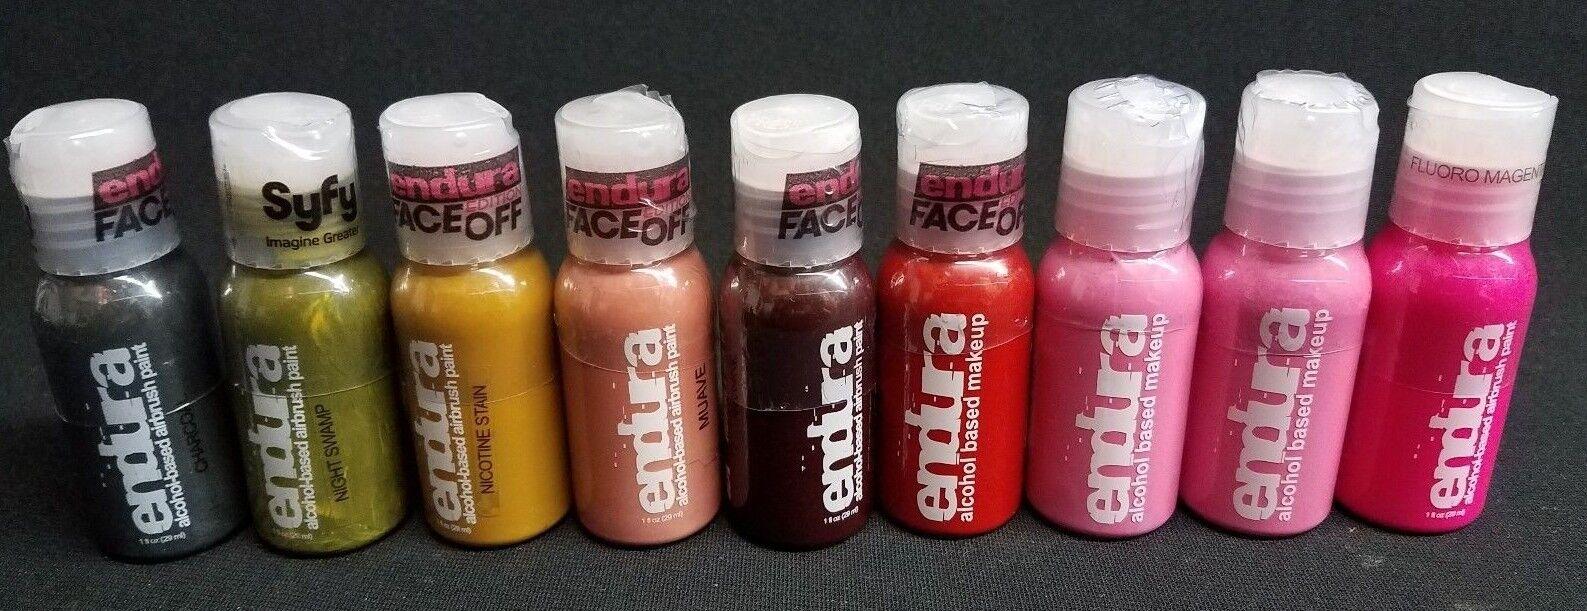 European Body Art Zerog Ii Airbrush Airgun With 6 Color Cartidges Makeup Set For Sale Online Ebay